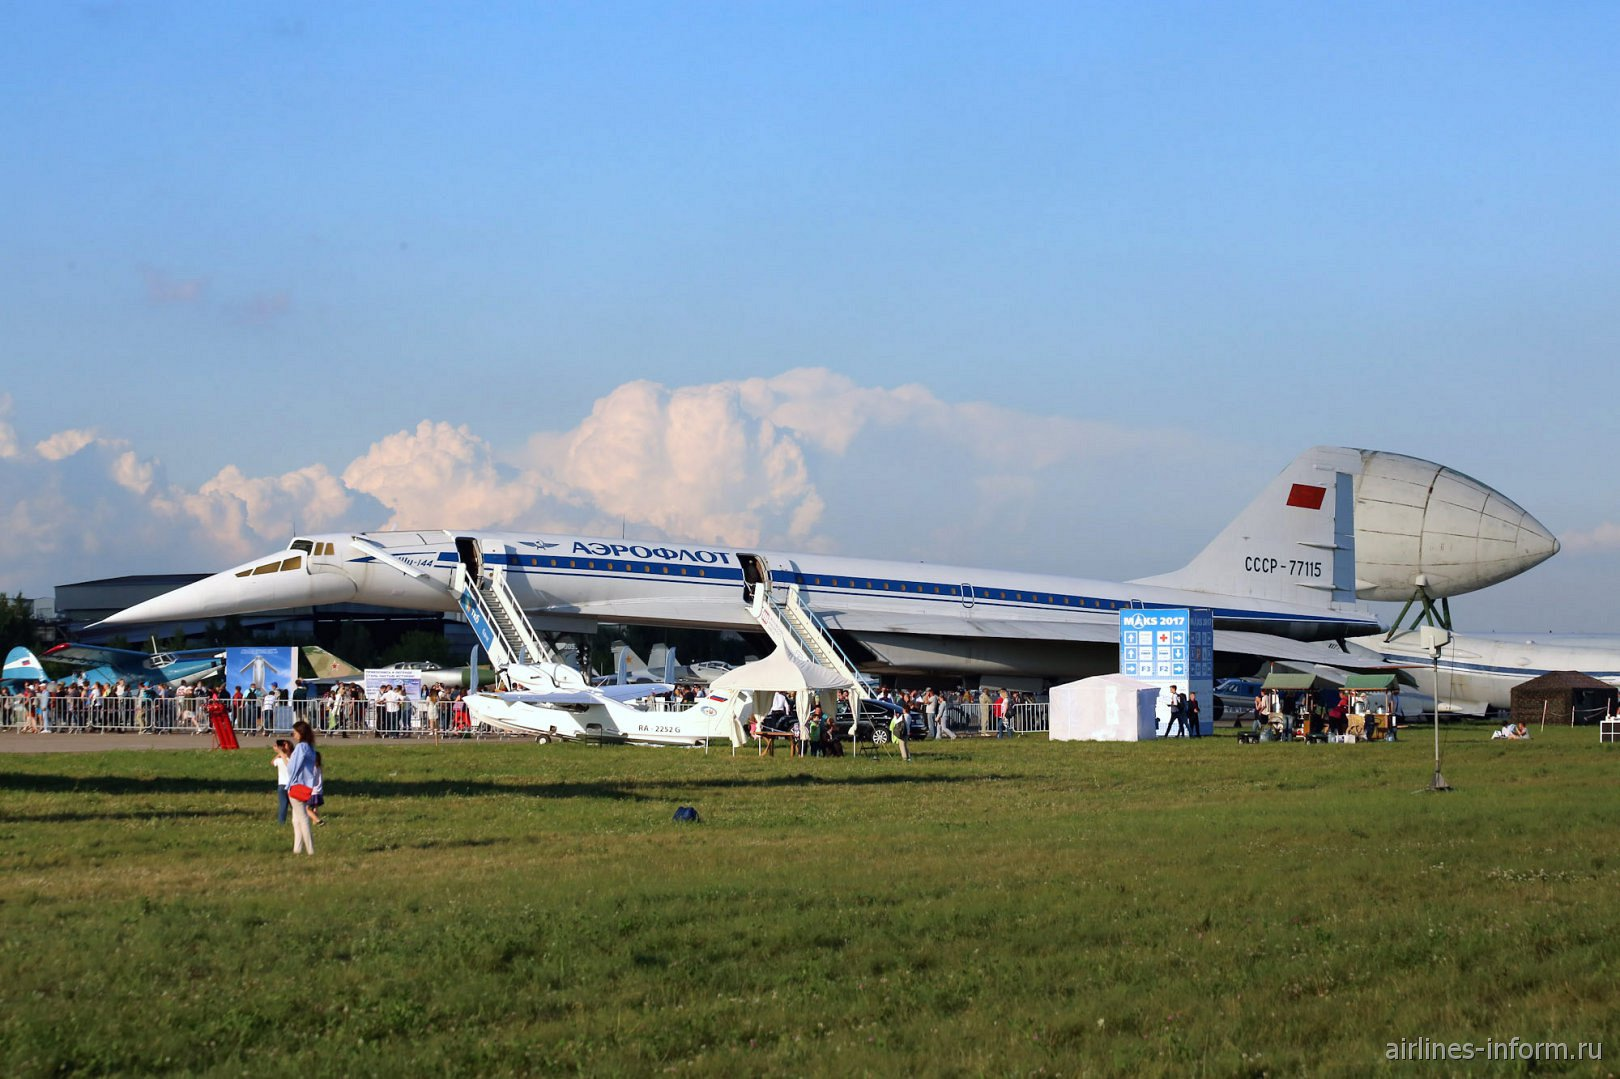 Самолет Ту-144 на авиасалоне МАКС-2017